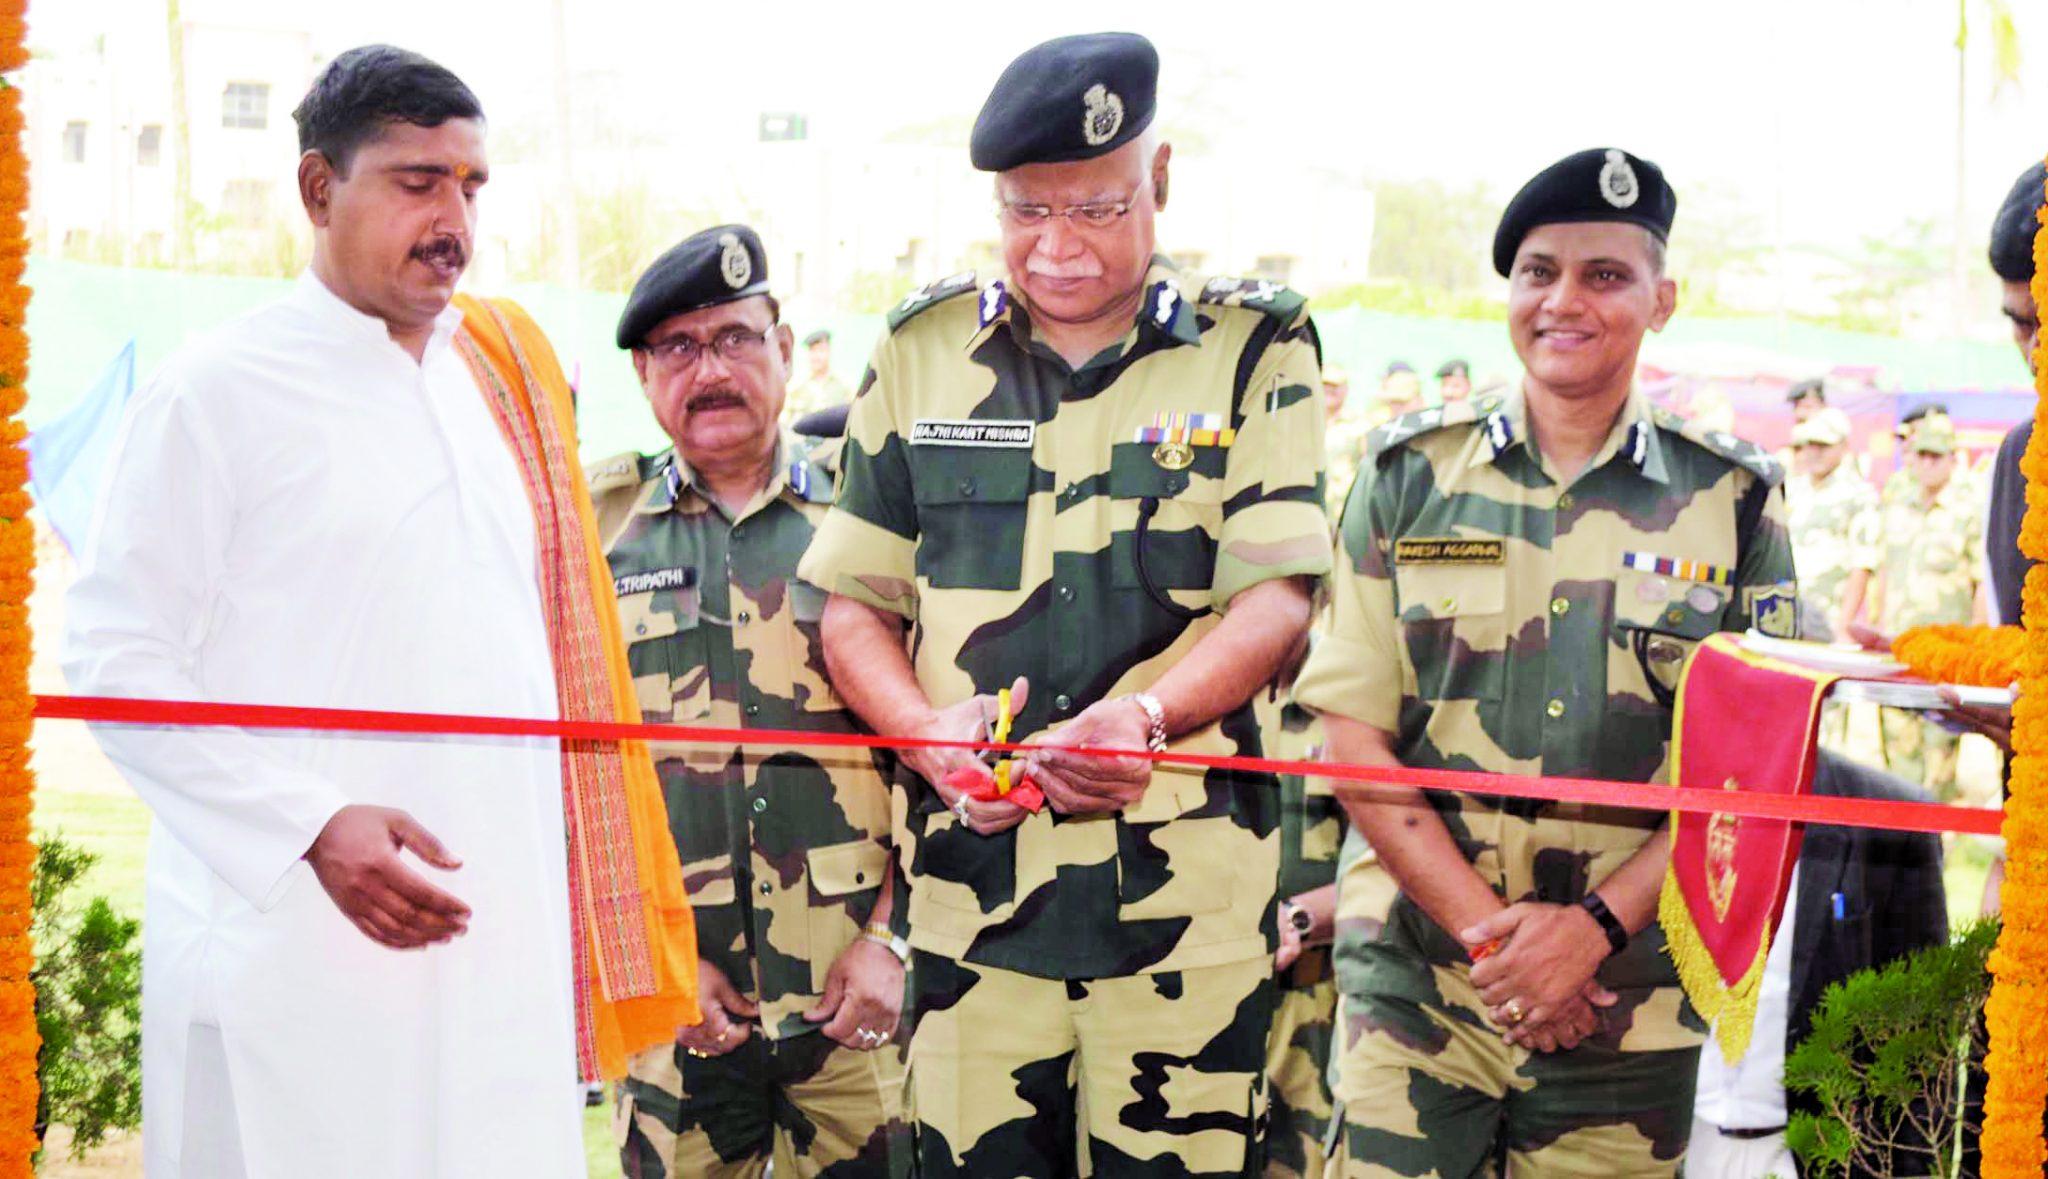 BSF Director General Rajni Kant Mishra inaugurates gym